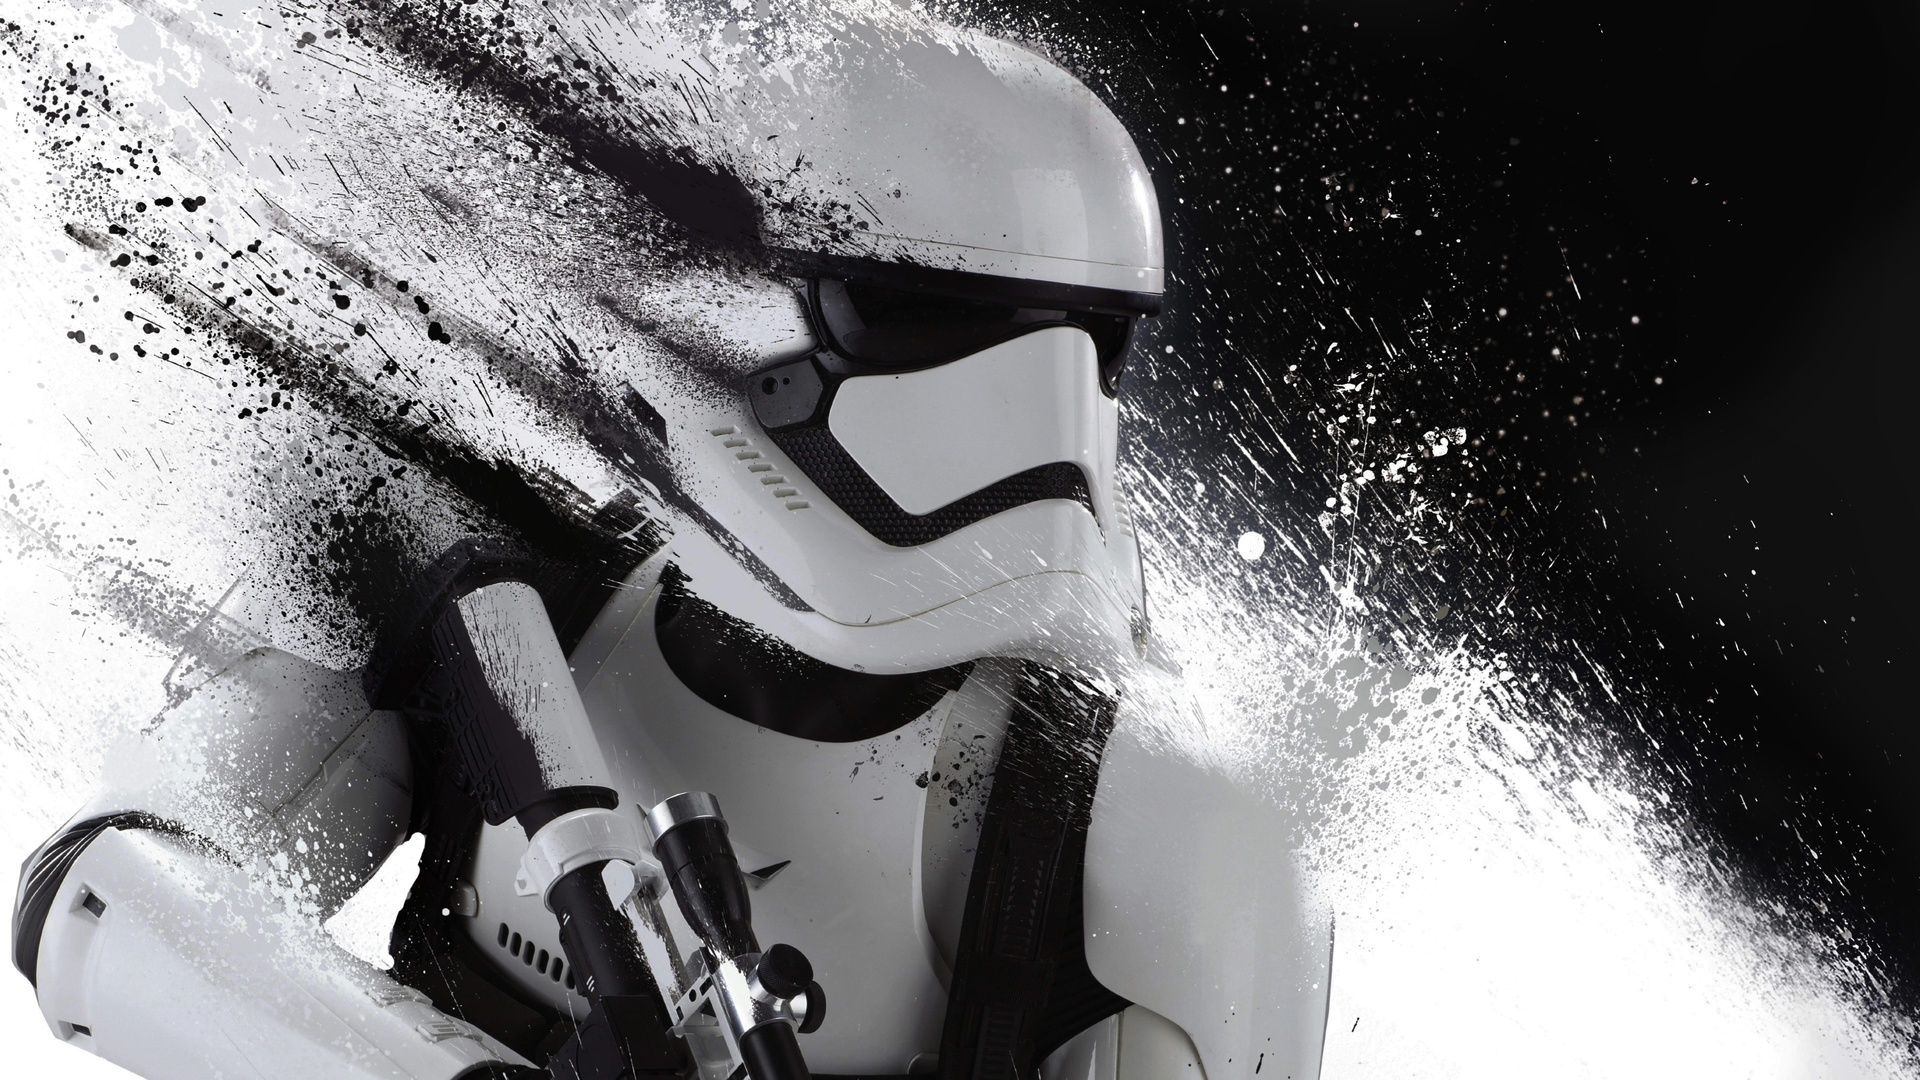 Star Wars Screensaver wallpaper photo full hd